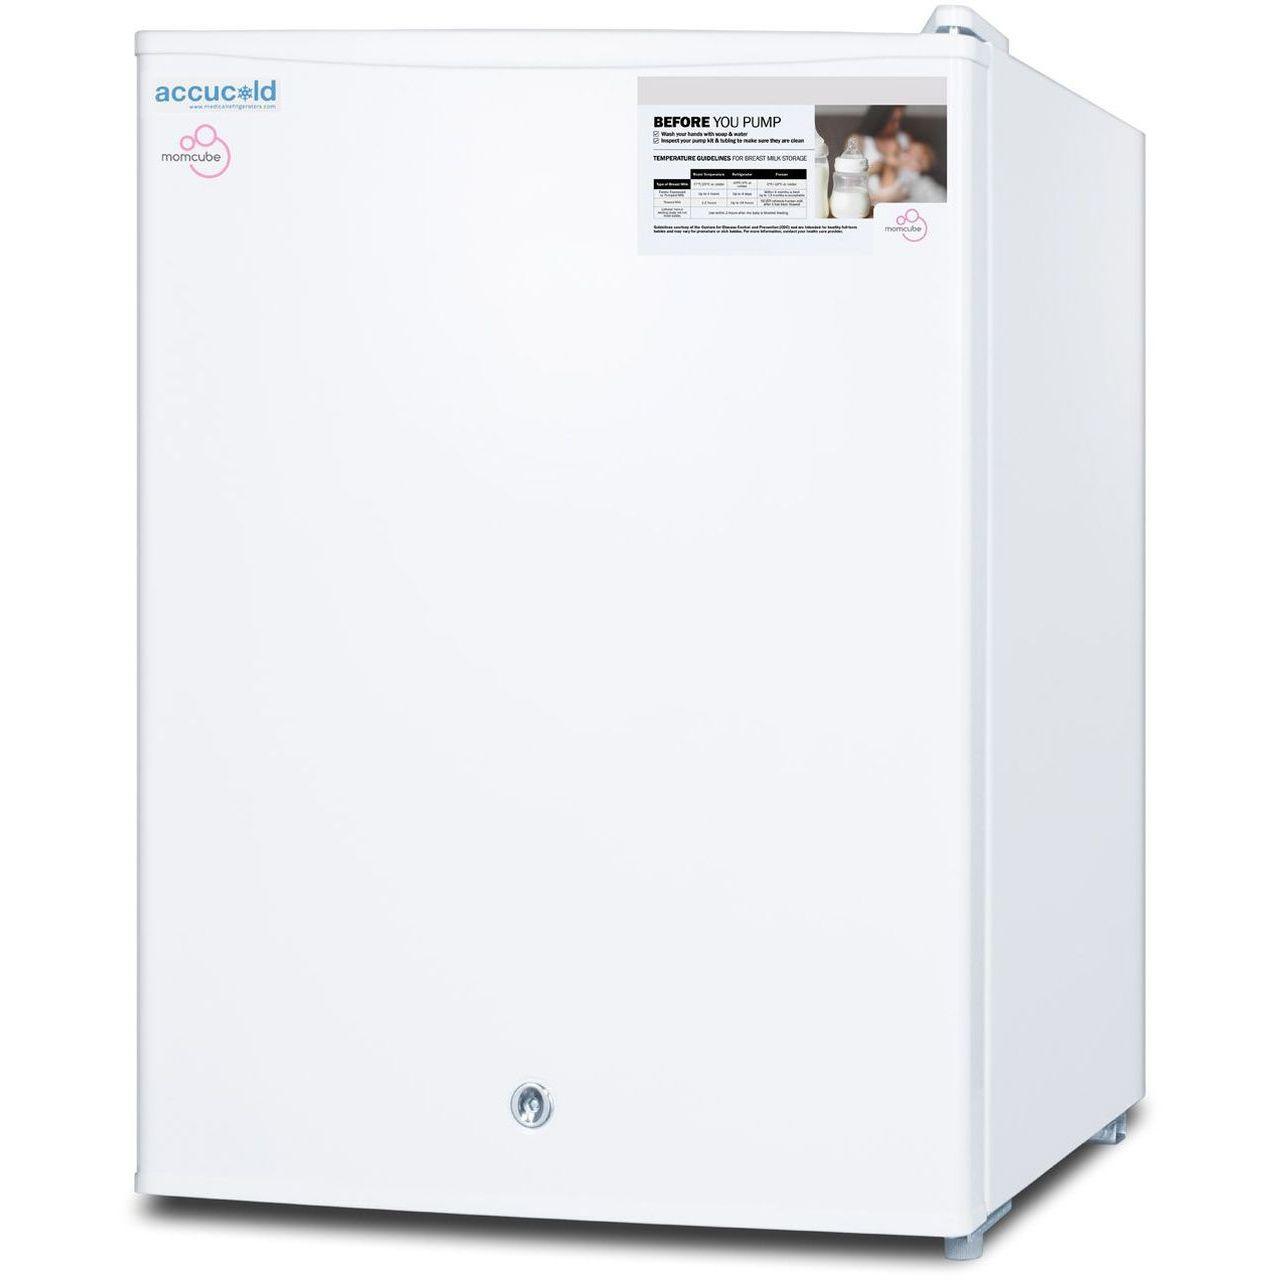 Summit FS30LMC 1.8 Cu Ft Countertop MOMCUBE Breast Milk Freezer